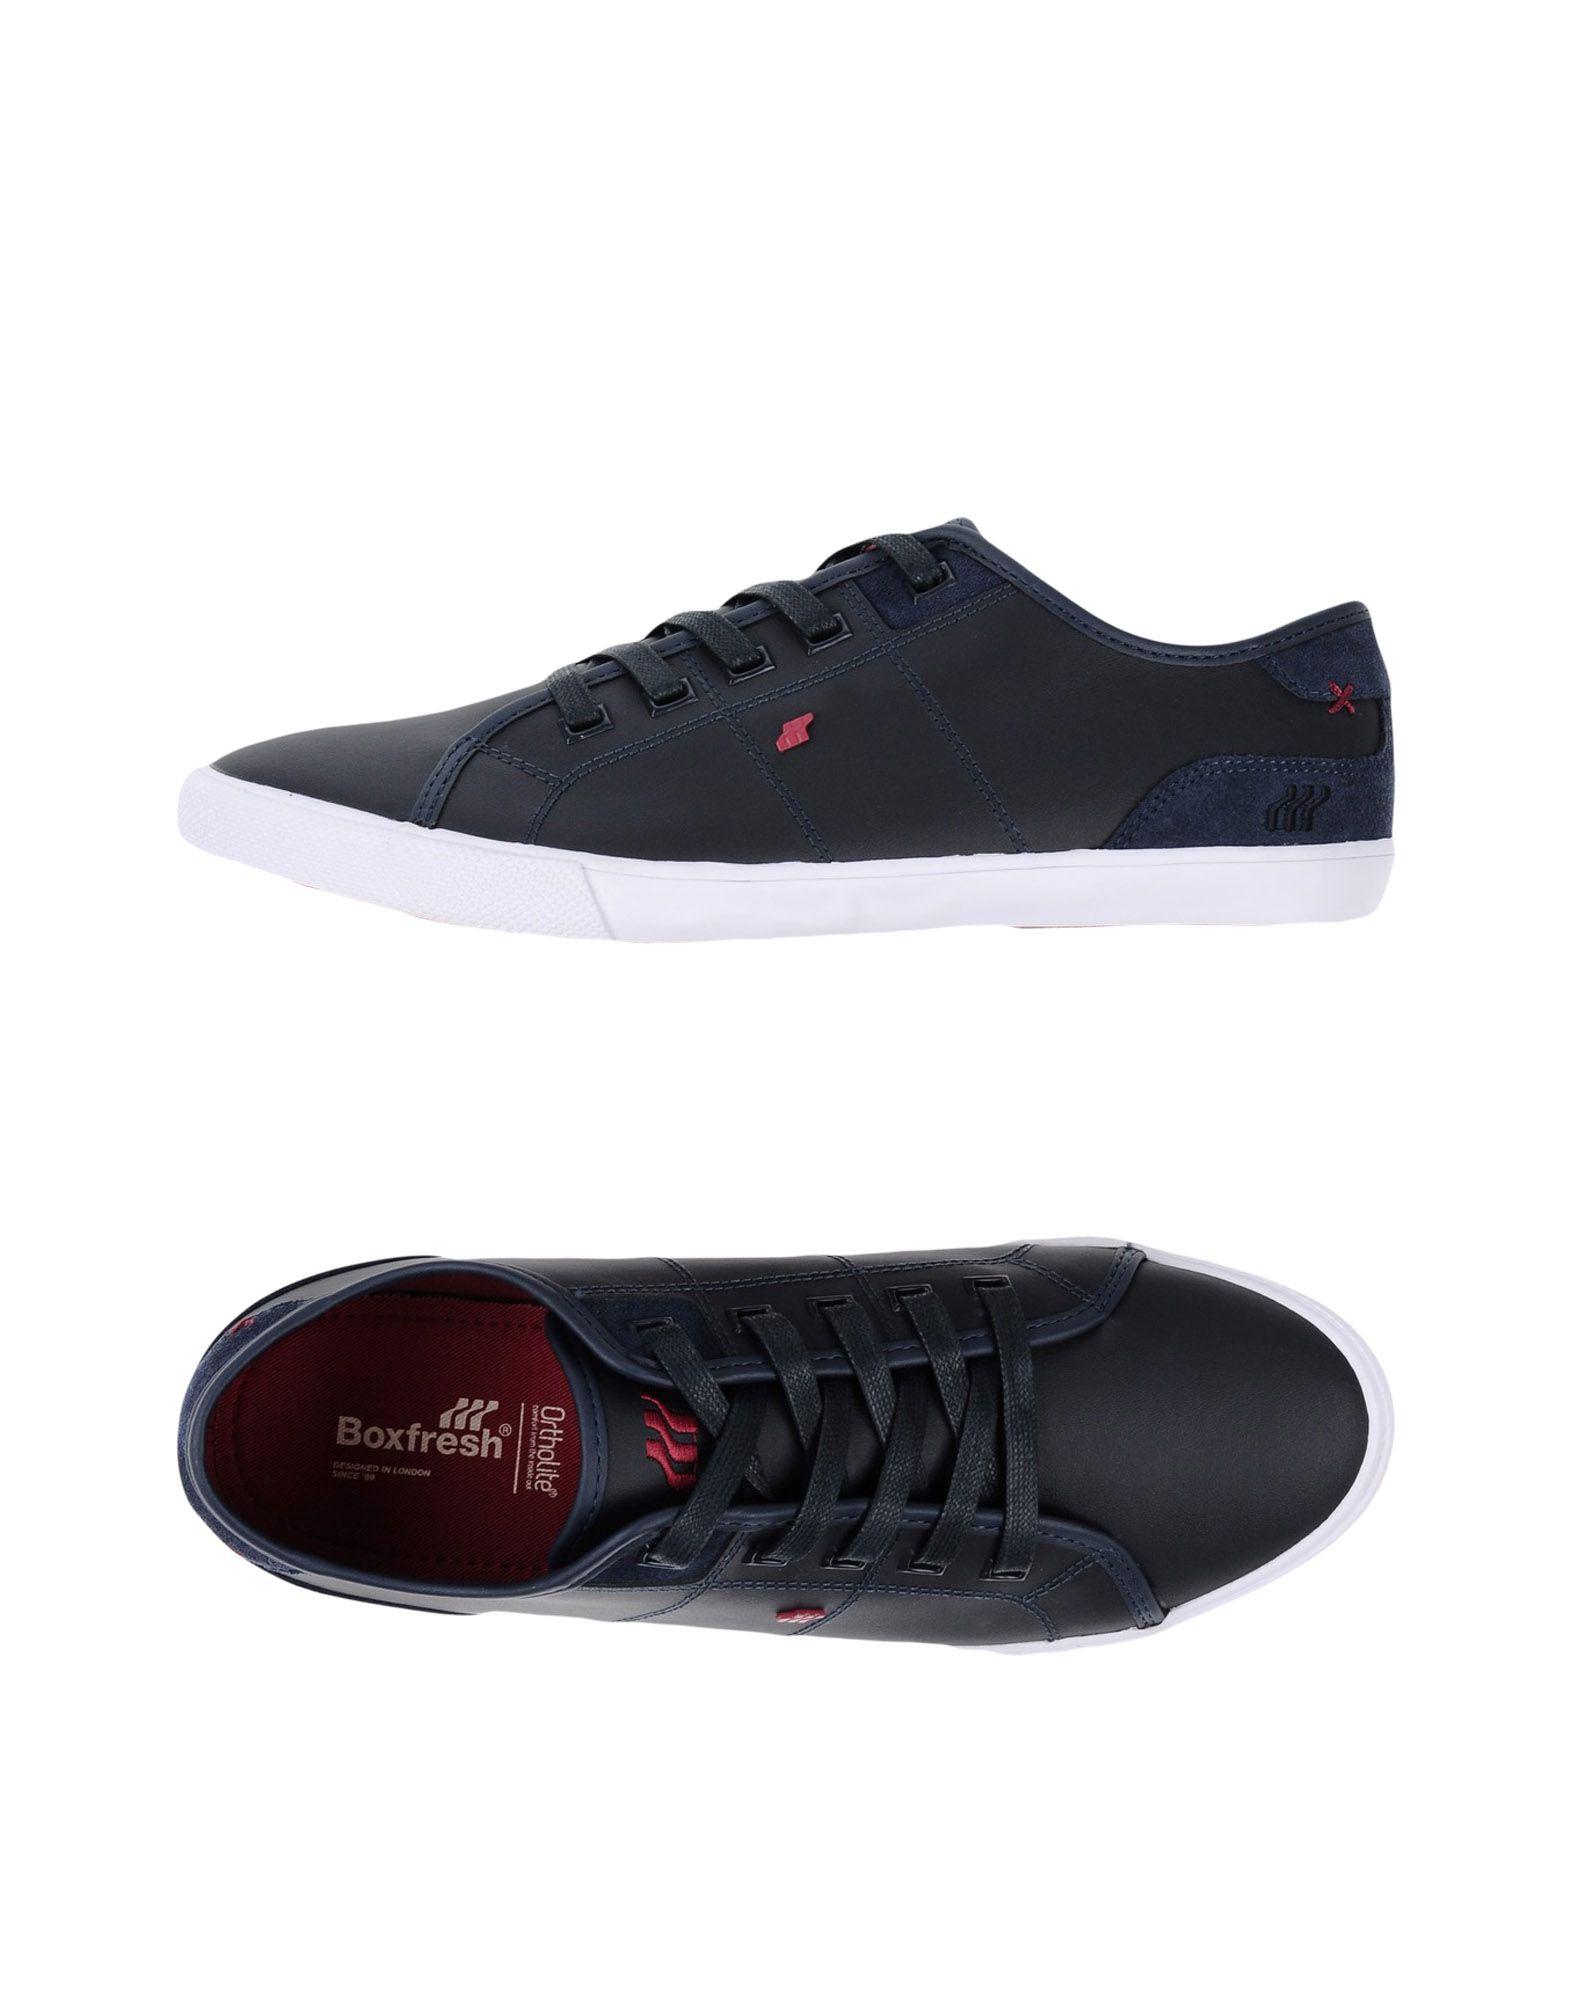 Sneakers Boxfresh Homme - Sneakers Boxfresh sur